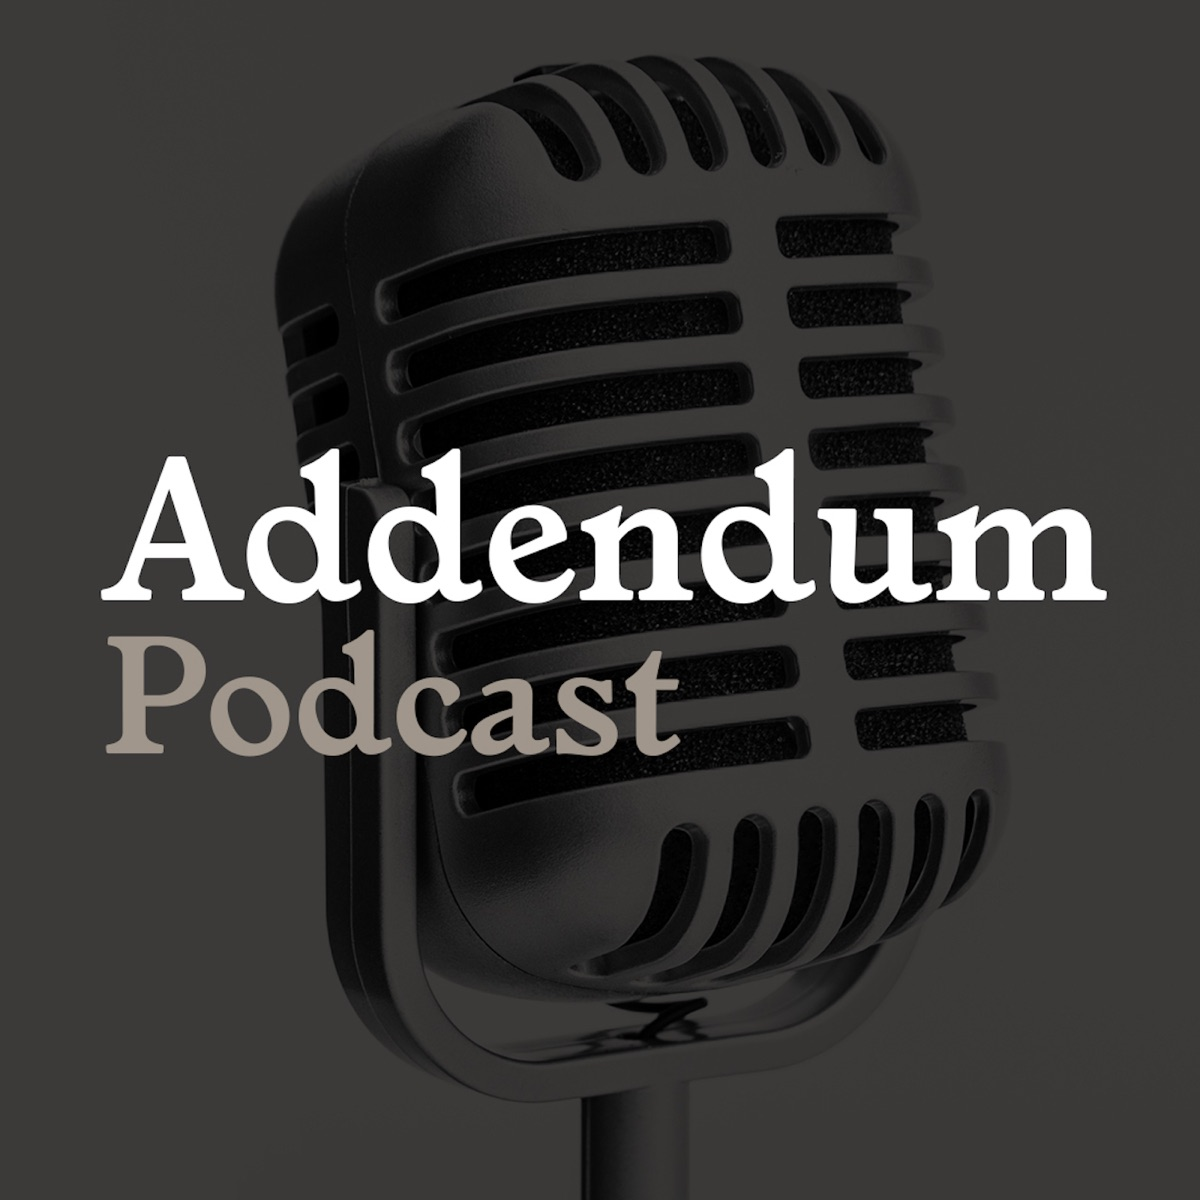 Addendum-Podcast